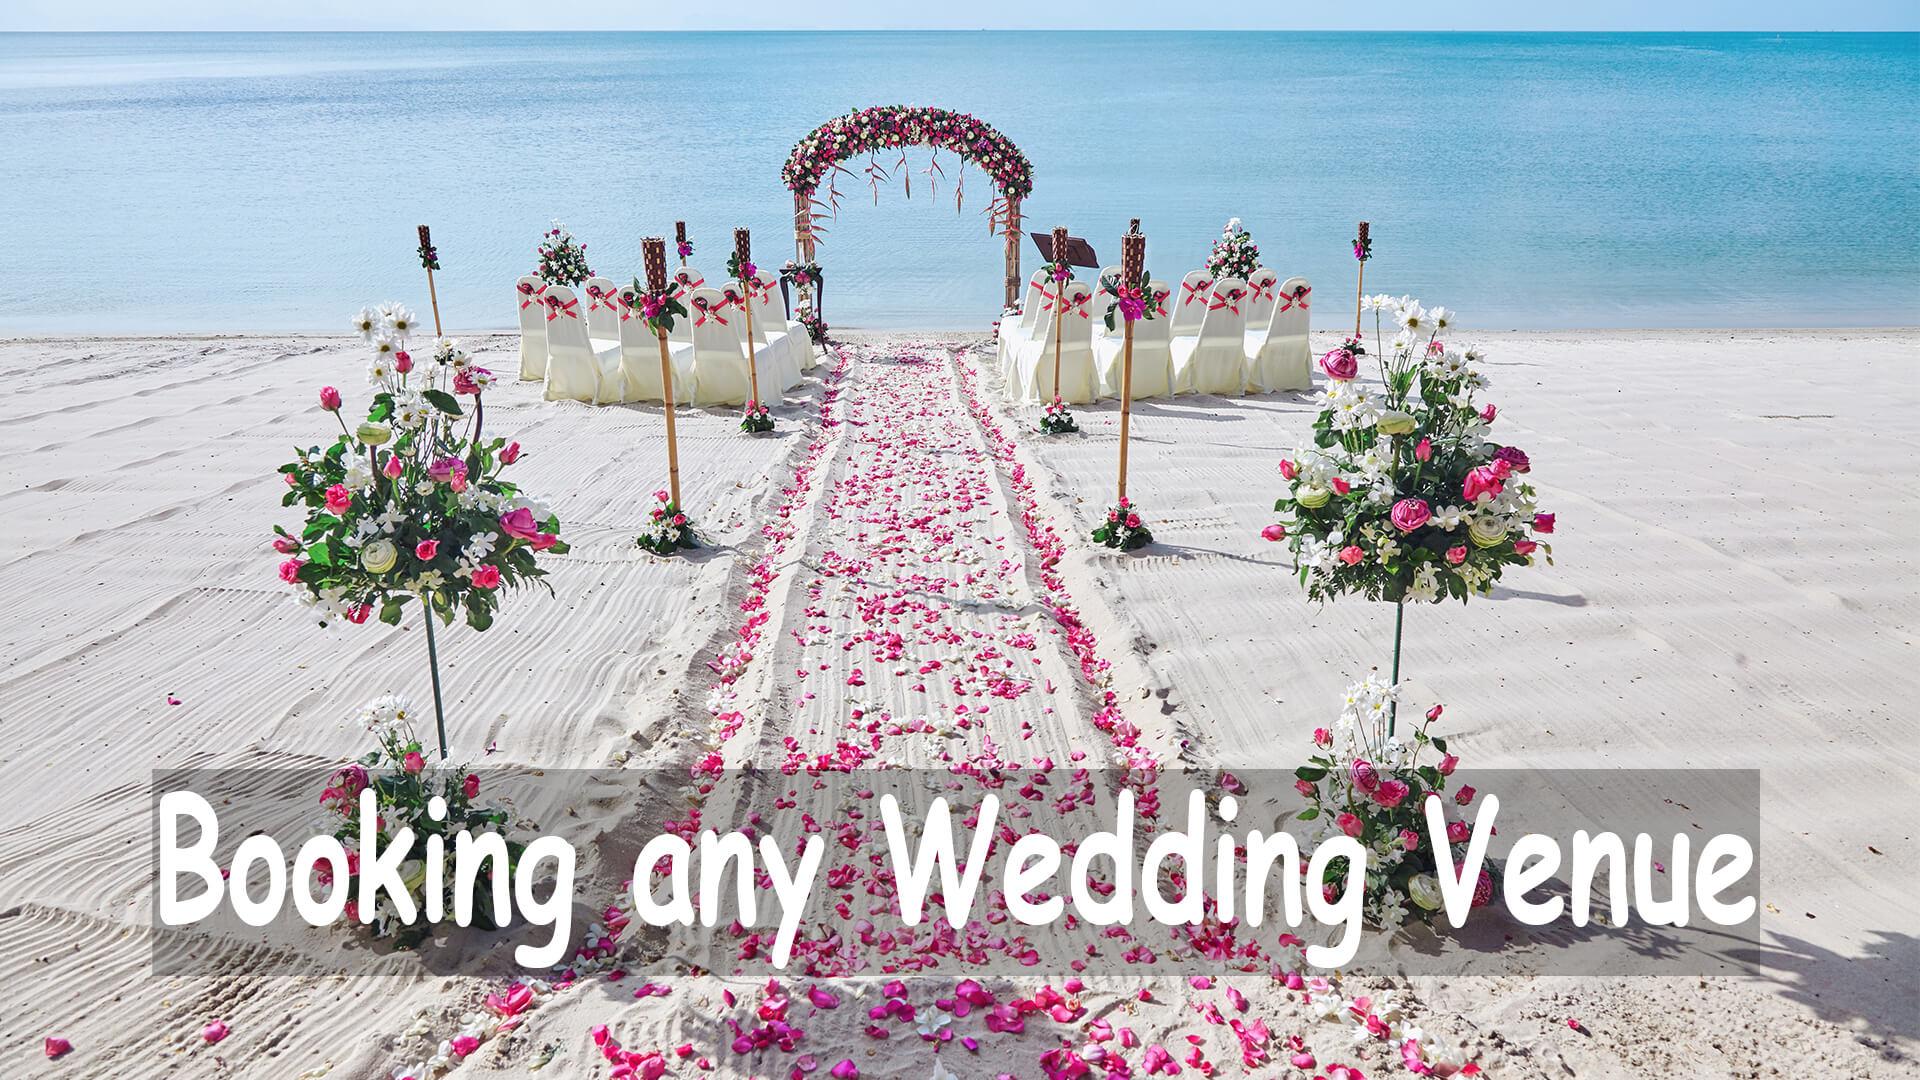 Booking any Wedding Venue